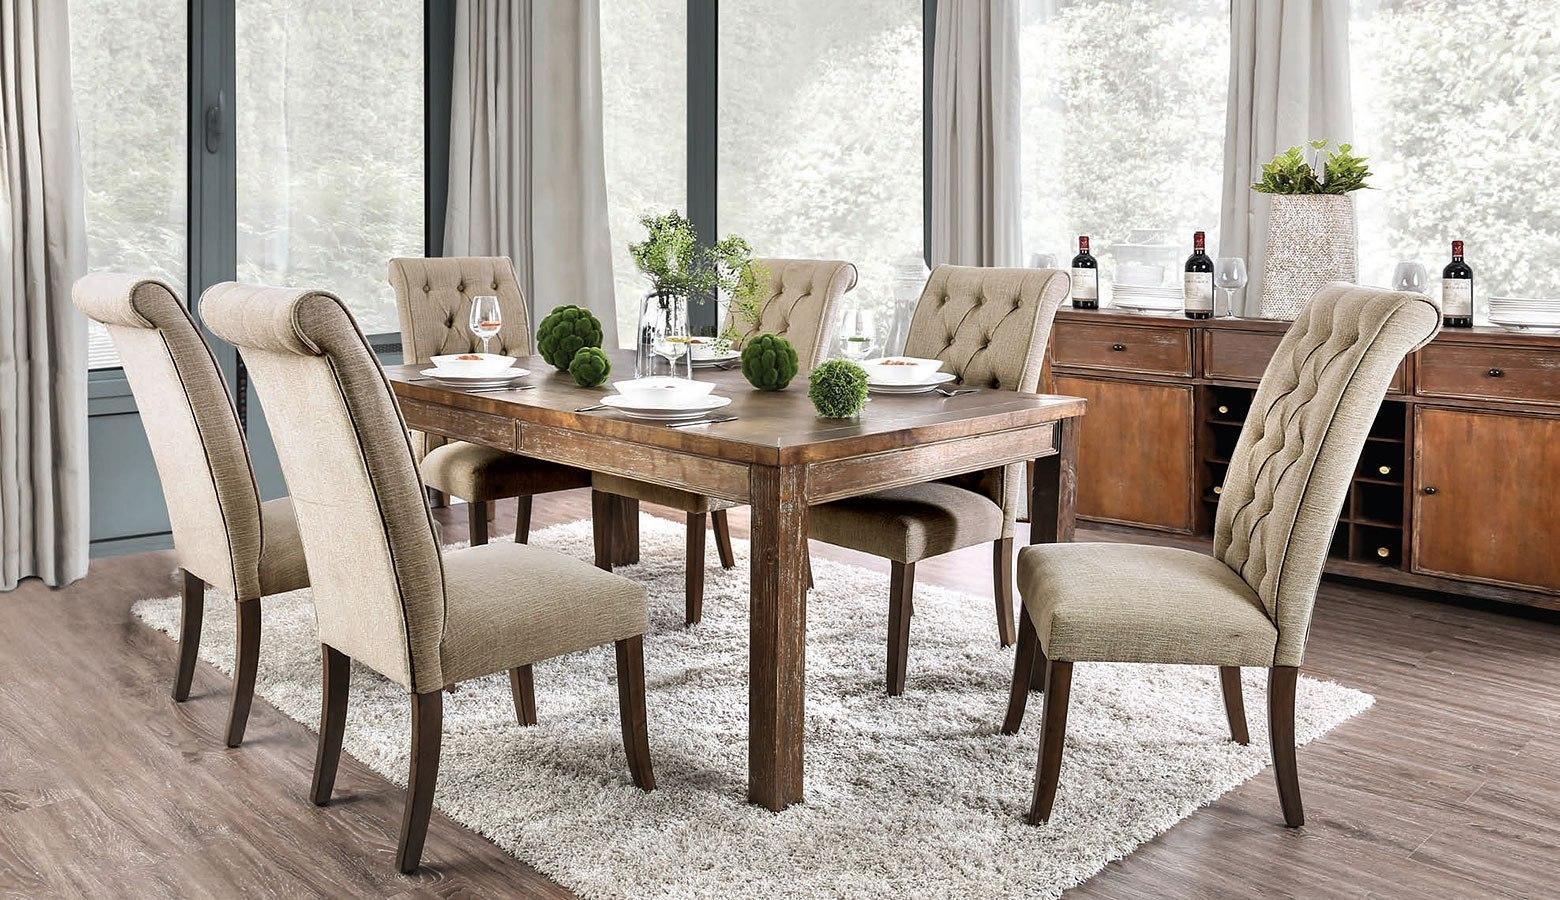 Picture of: Sania I Dining Room Set Rustic Oak By Furniture Of America Furniturepick